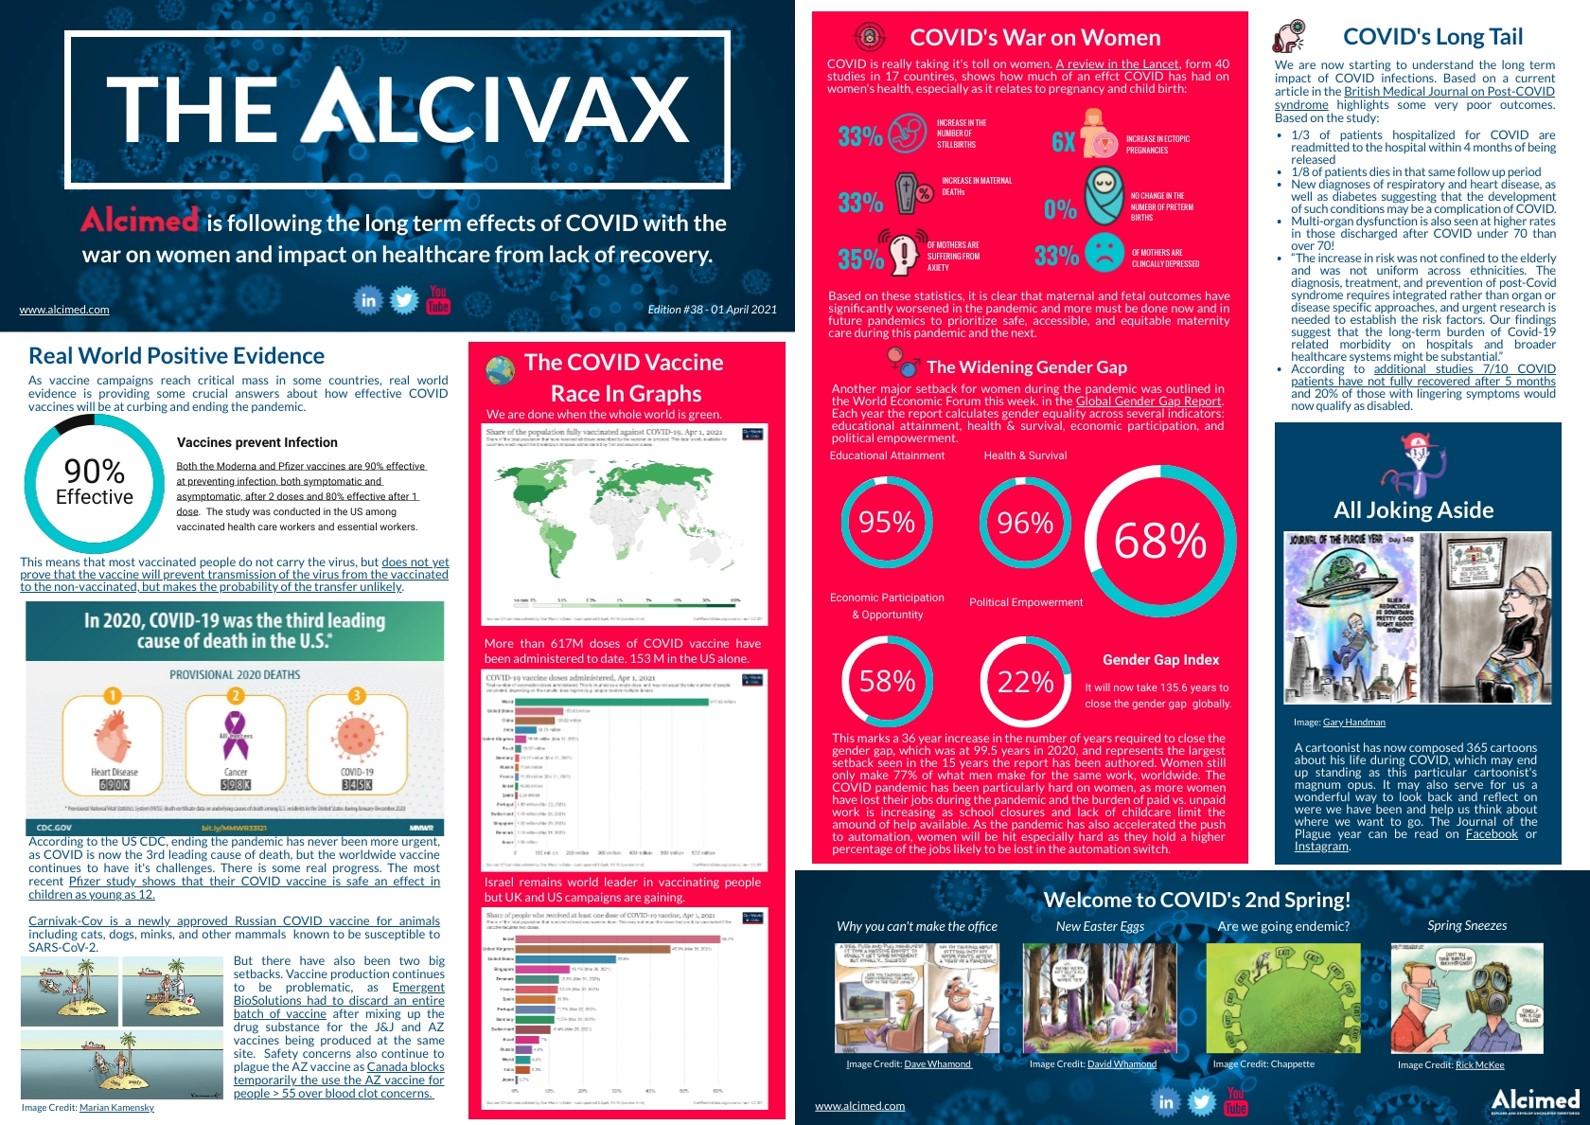 Alcivax#38-logbook-article-Alcimed-covid19-coronavirus